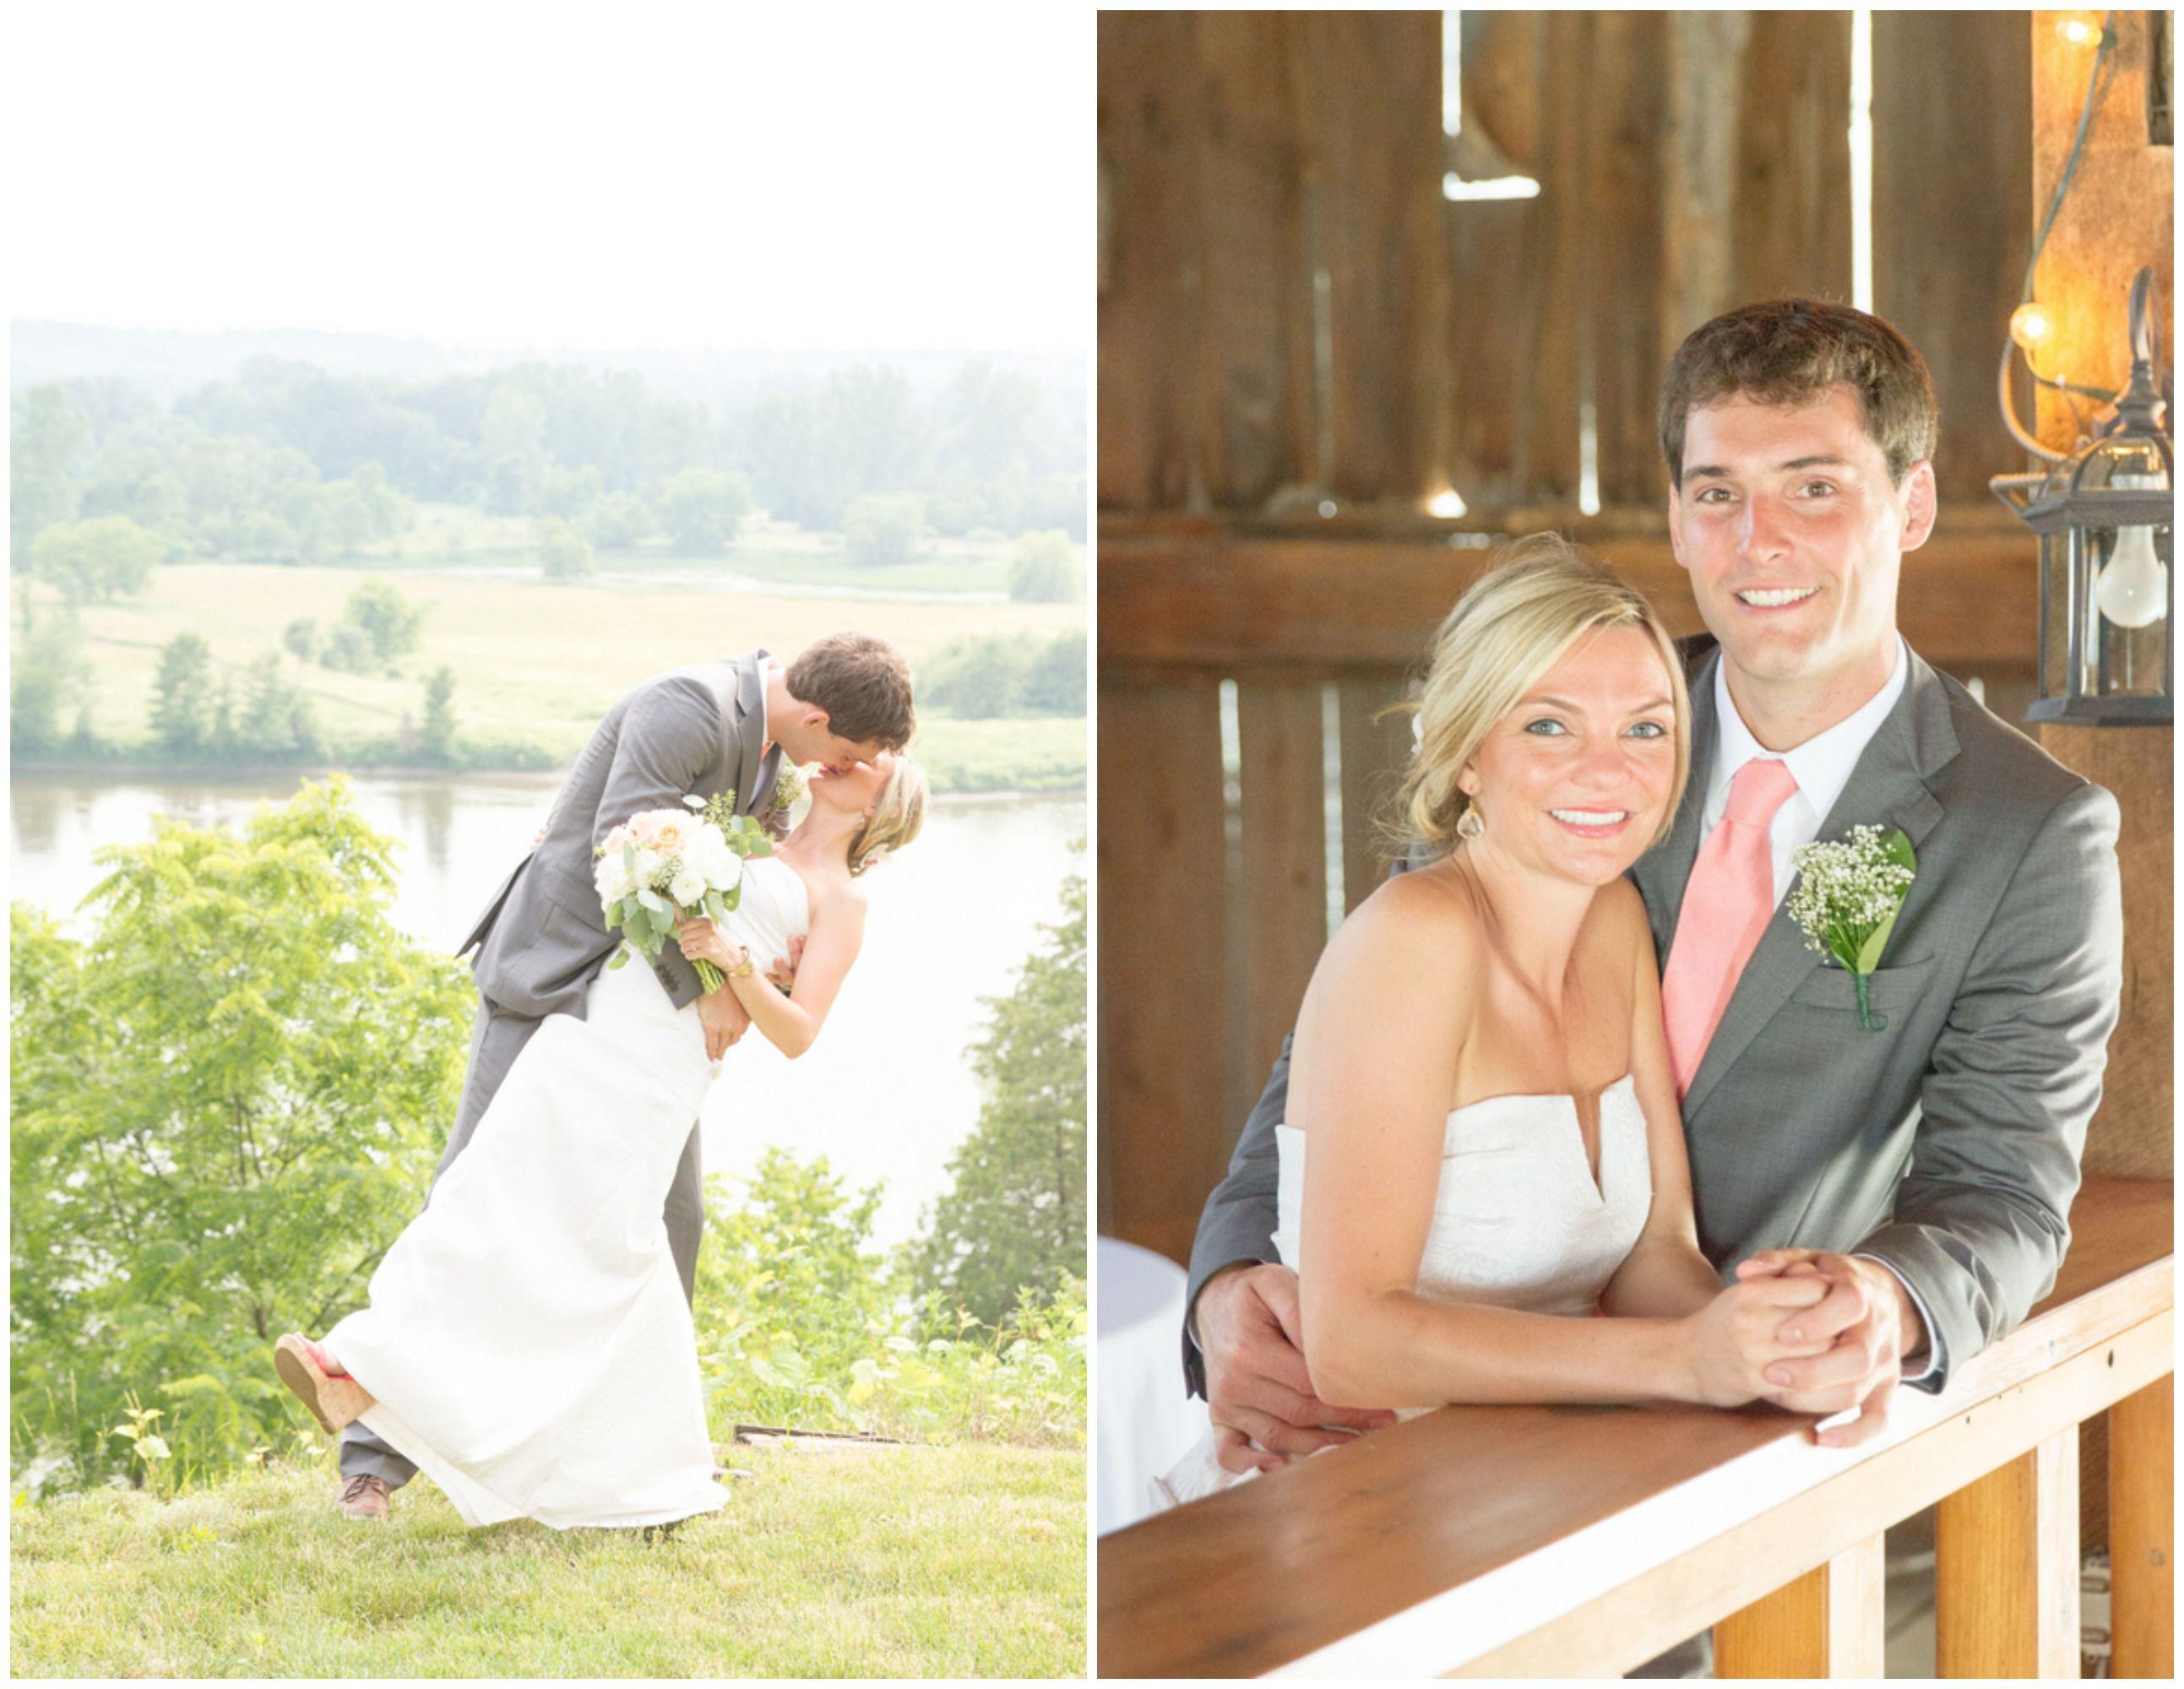 Ontario Country Farm Wedding Rustic Wedding Chic